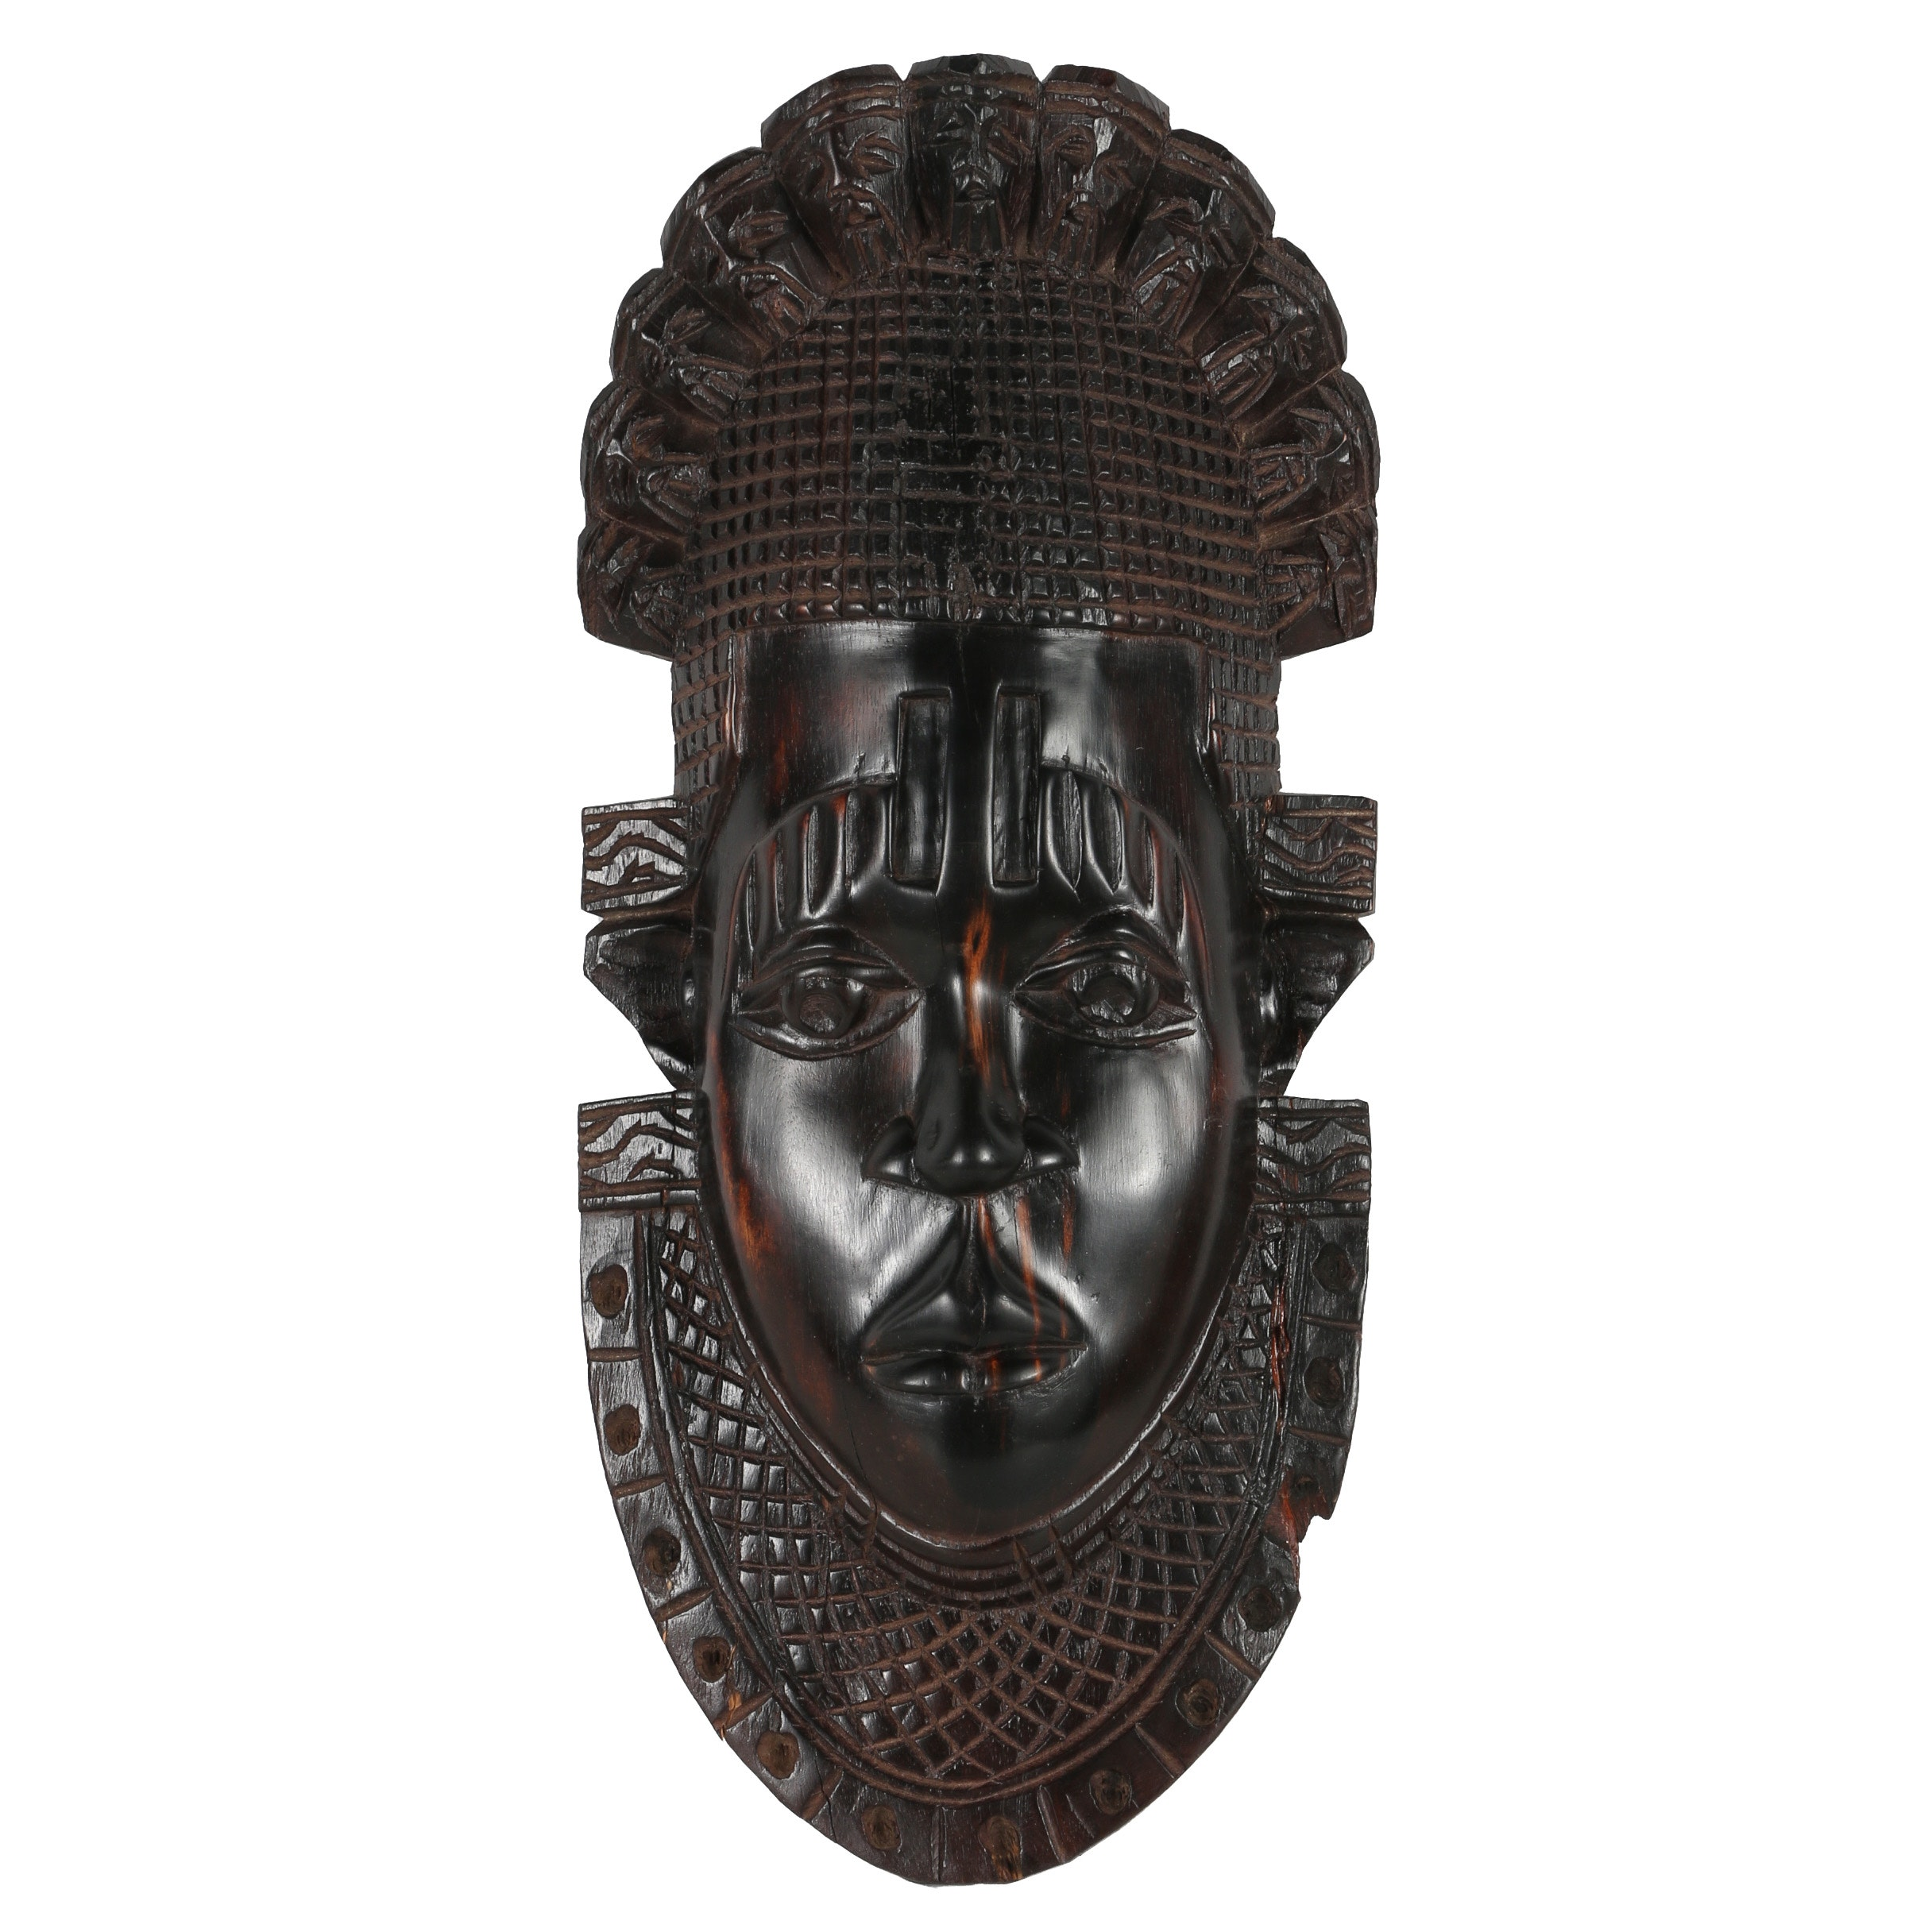 Nigerian Benin Style Carved Wood Mask